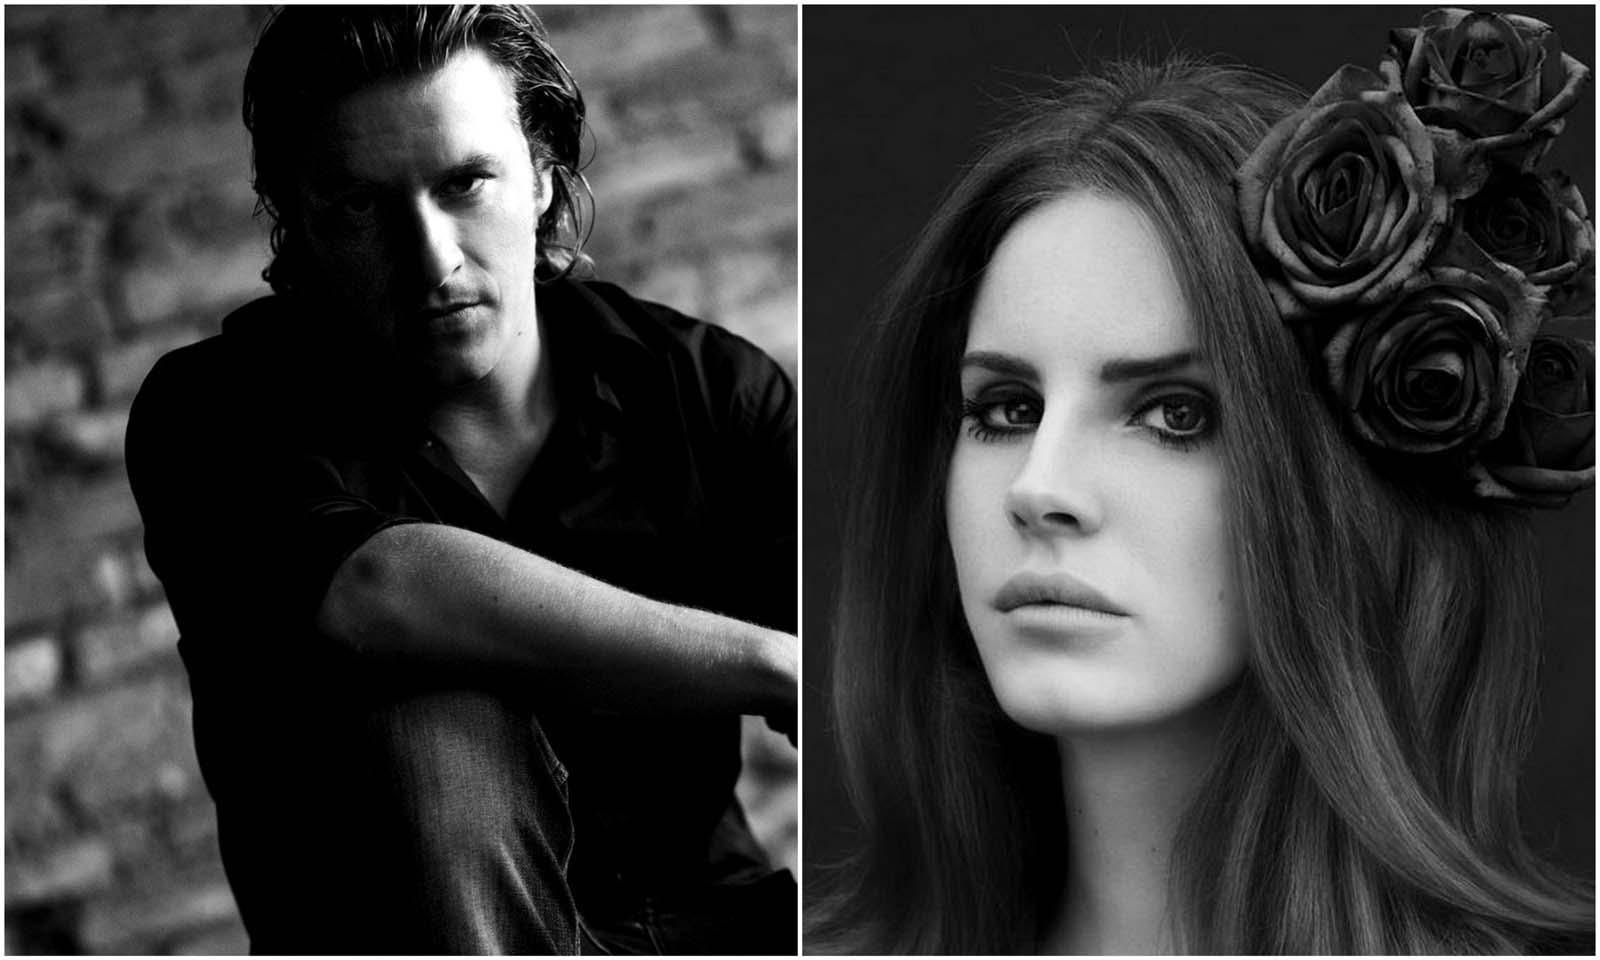 Marcus Füreder/Parov Stelar şi Lana Del Rey